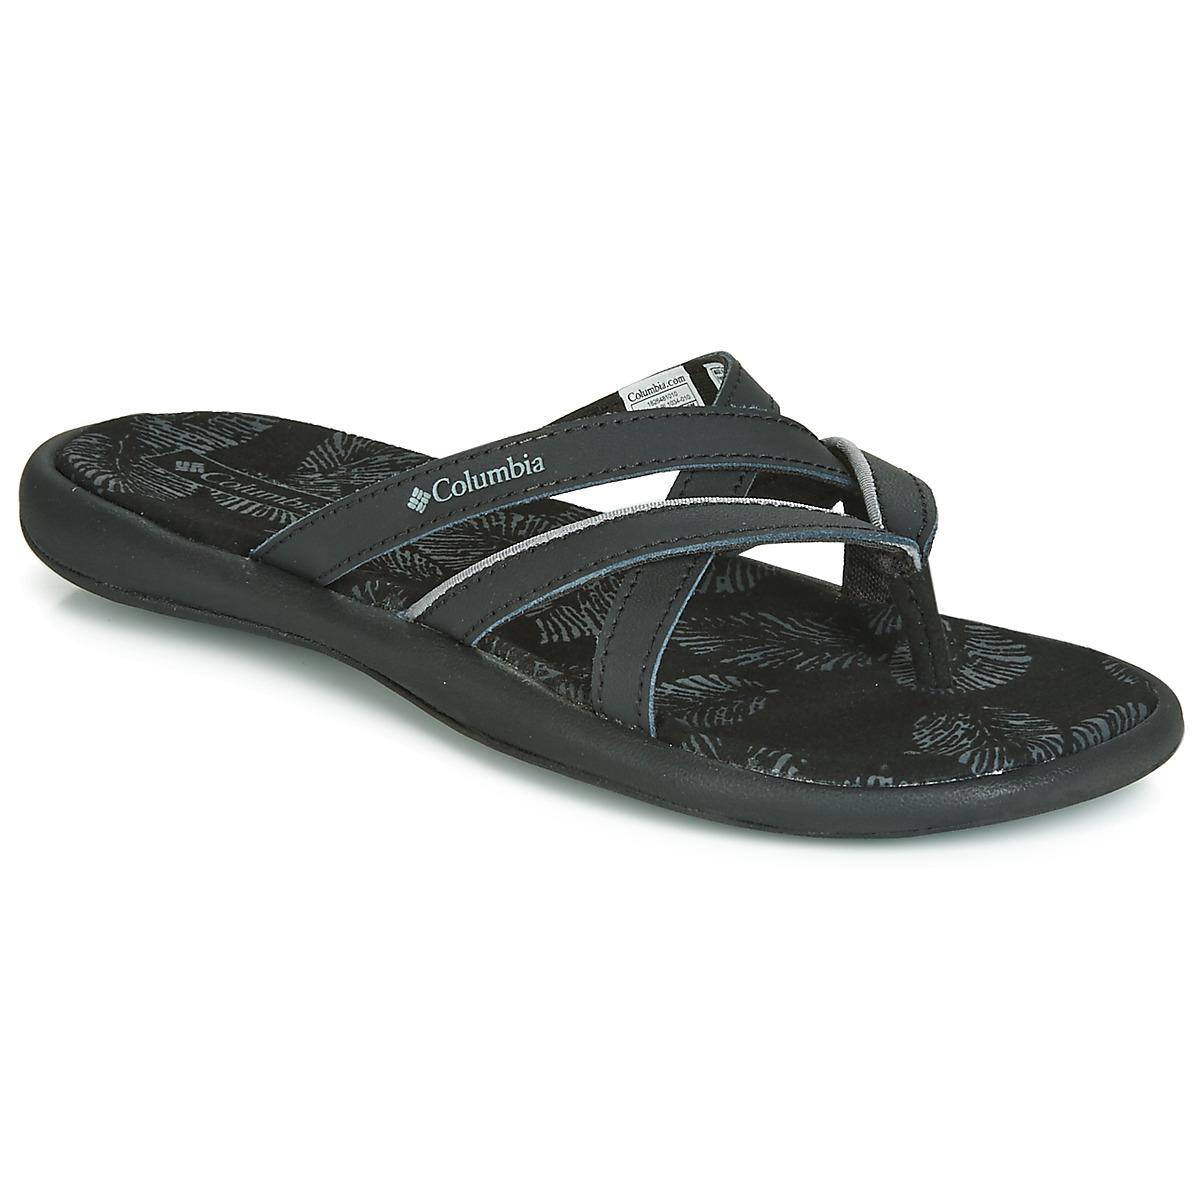 04fa0ff15039 Columbia - Kambi Ii Women s Flip Flops   Sandals (shoes) In Black - Lyst.  View fullscreen